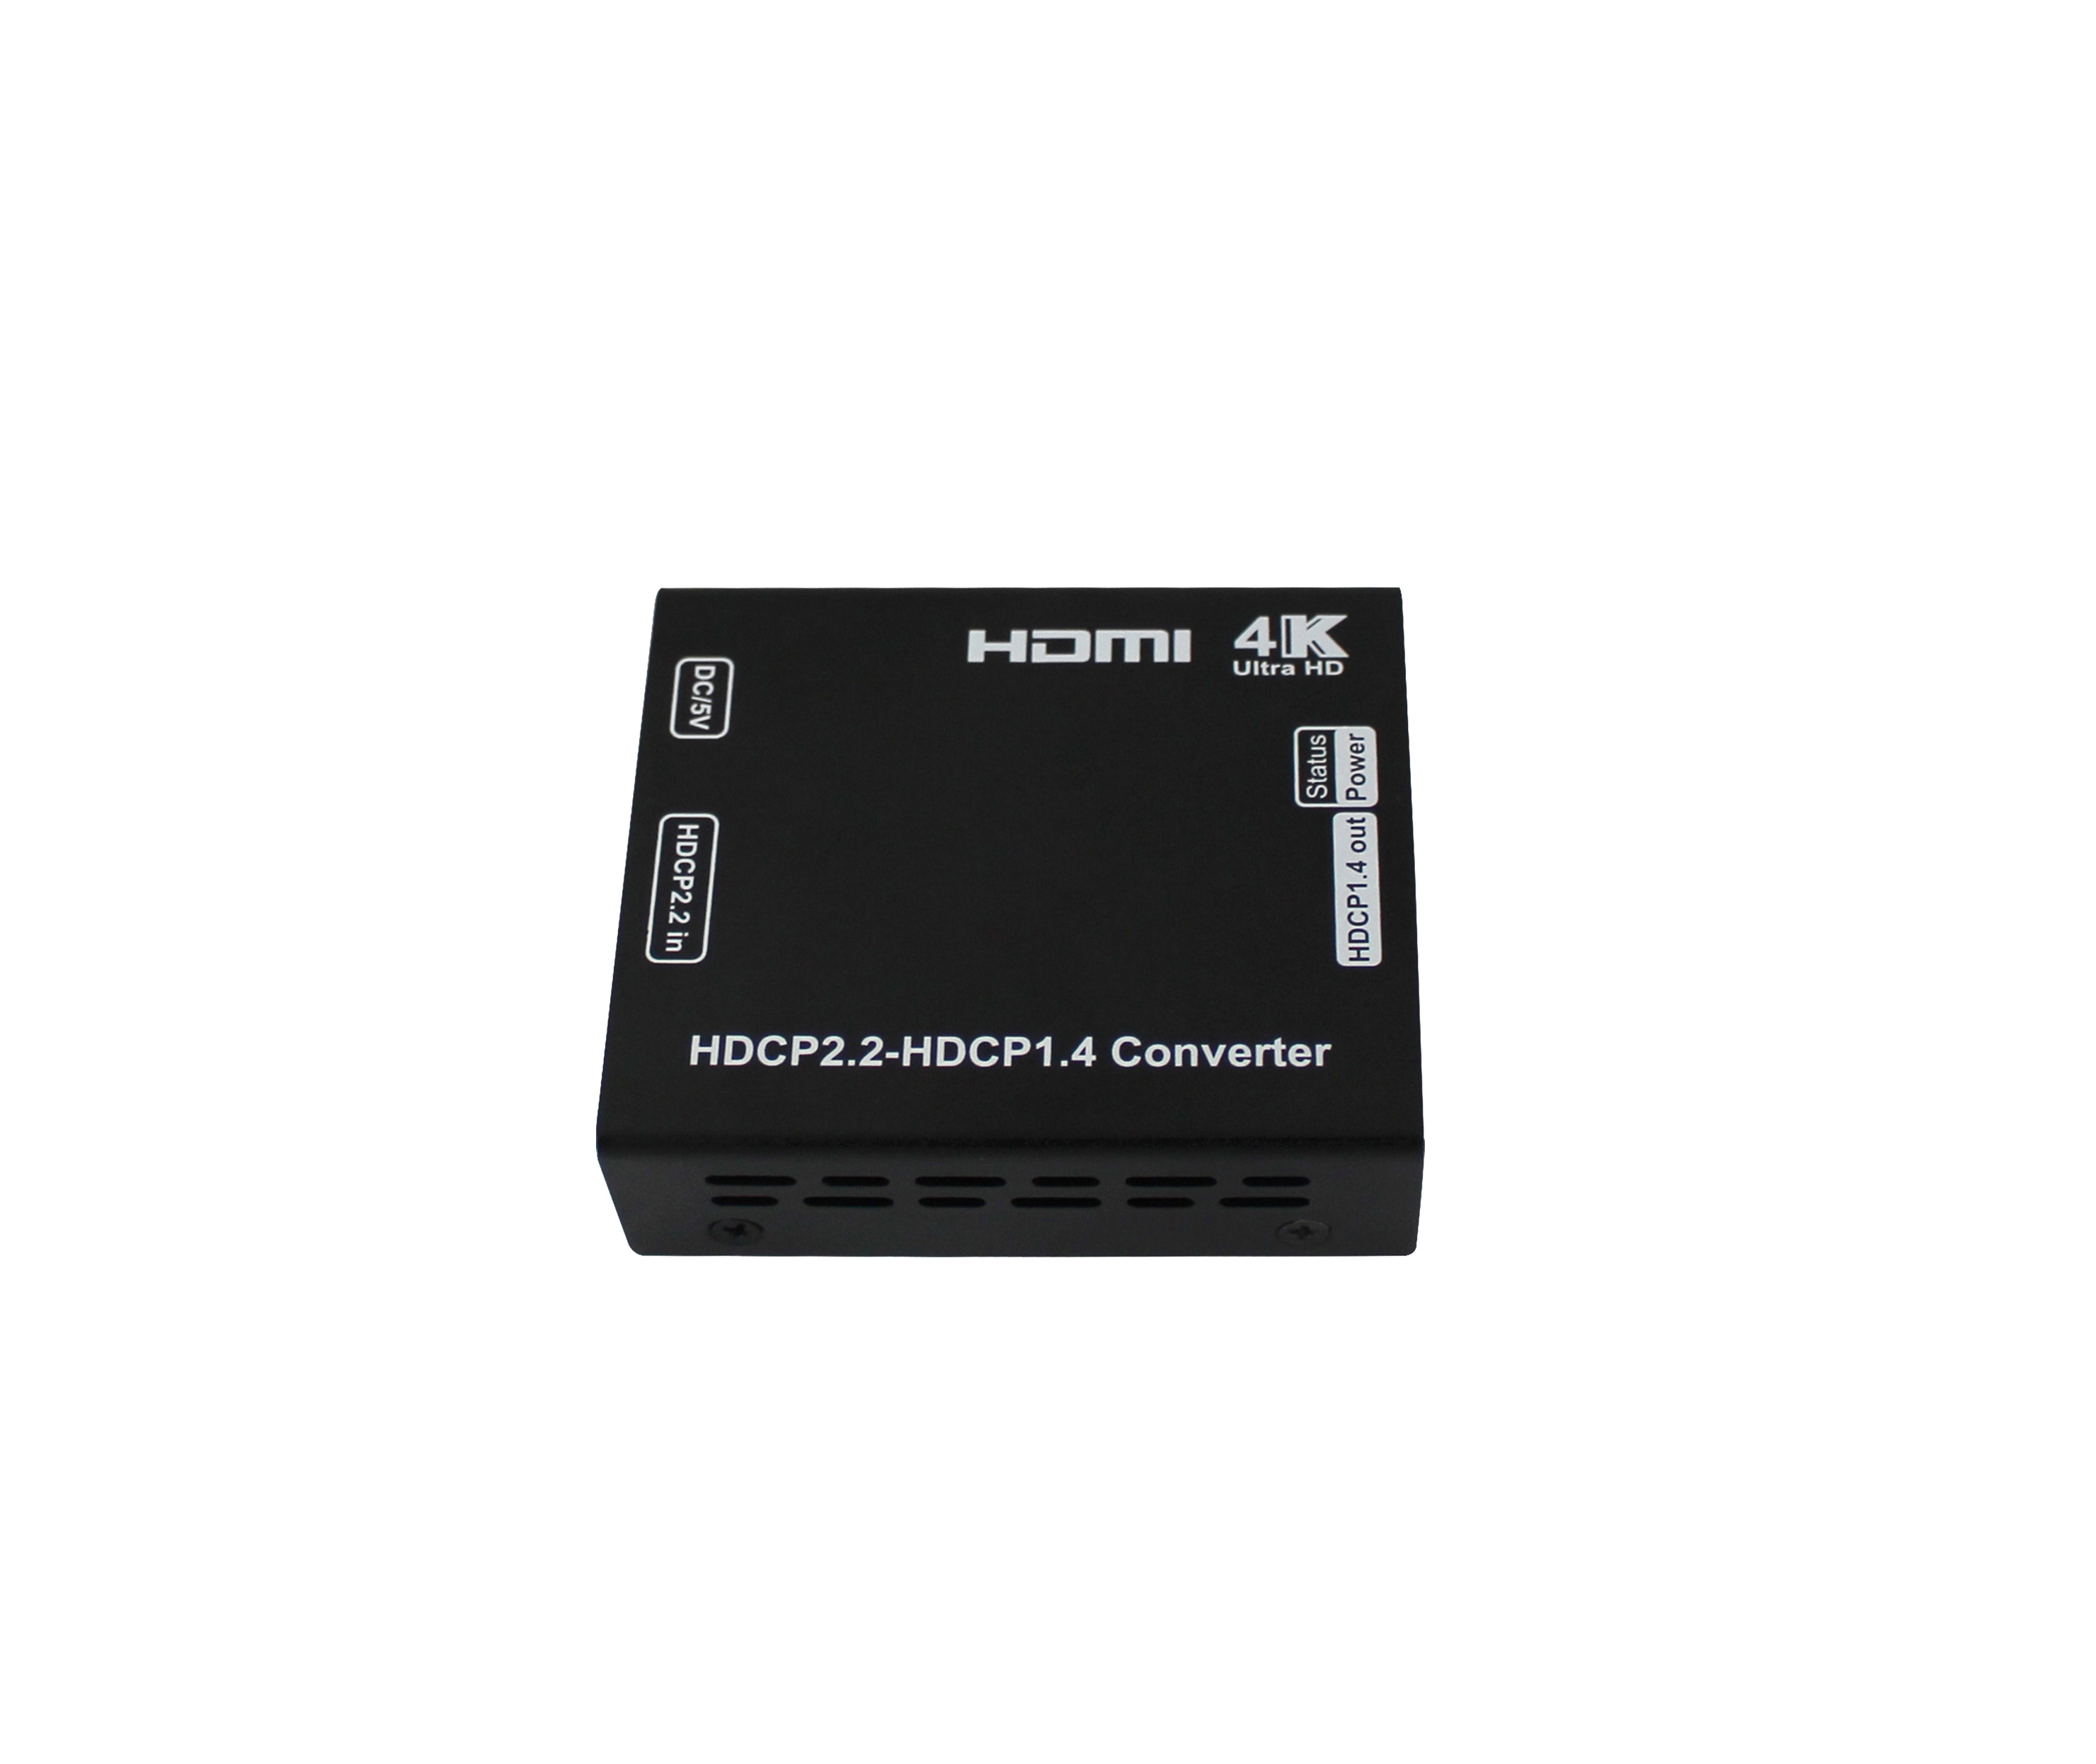 HDCP2.2 to HDCP1.4 converter